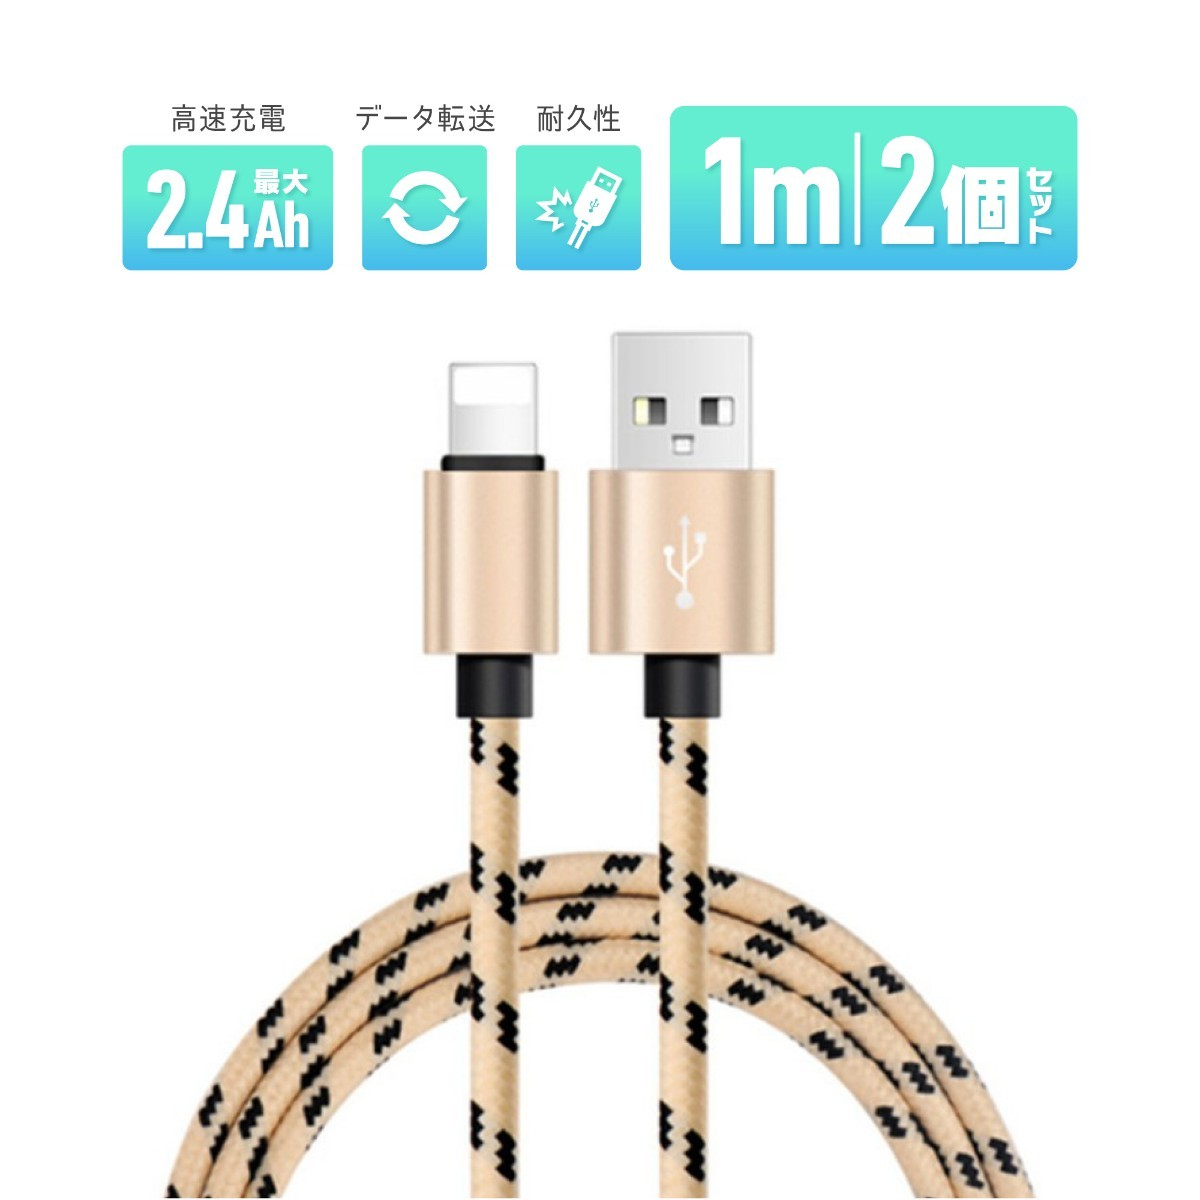 Apple ライトニング充電ケーブル 純正同等品1m×2本